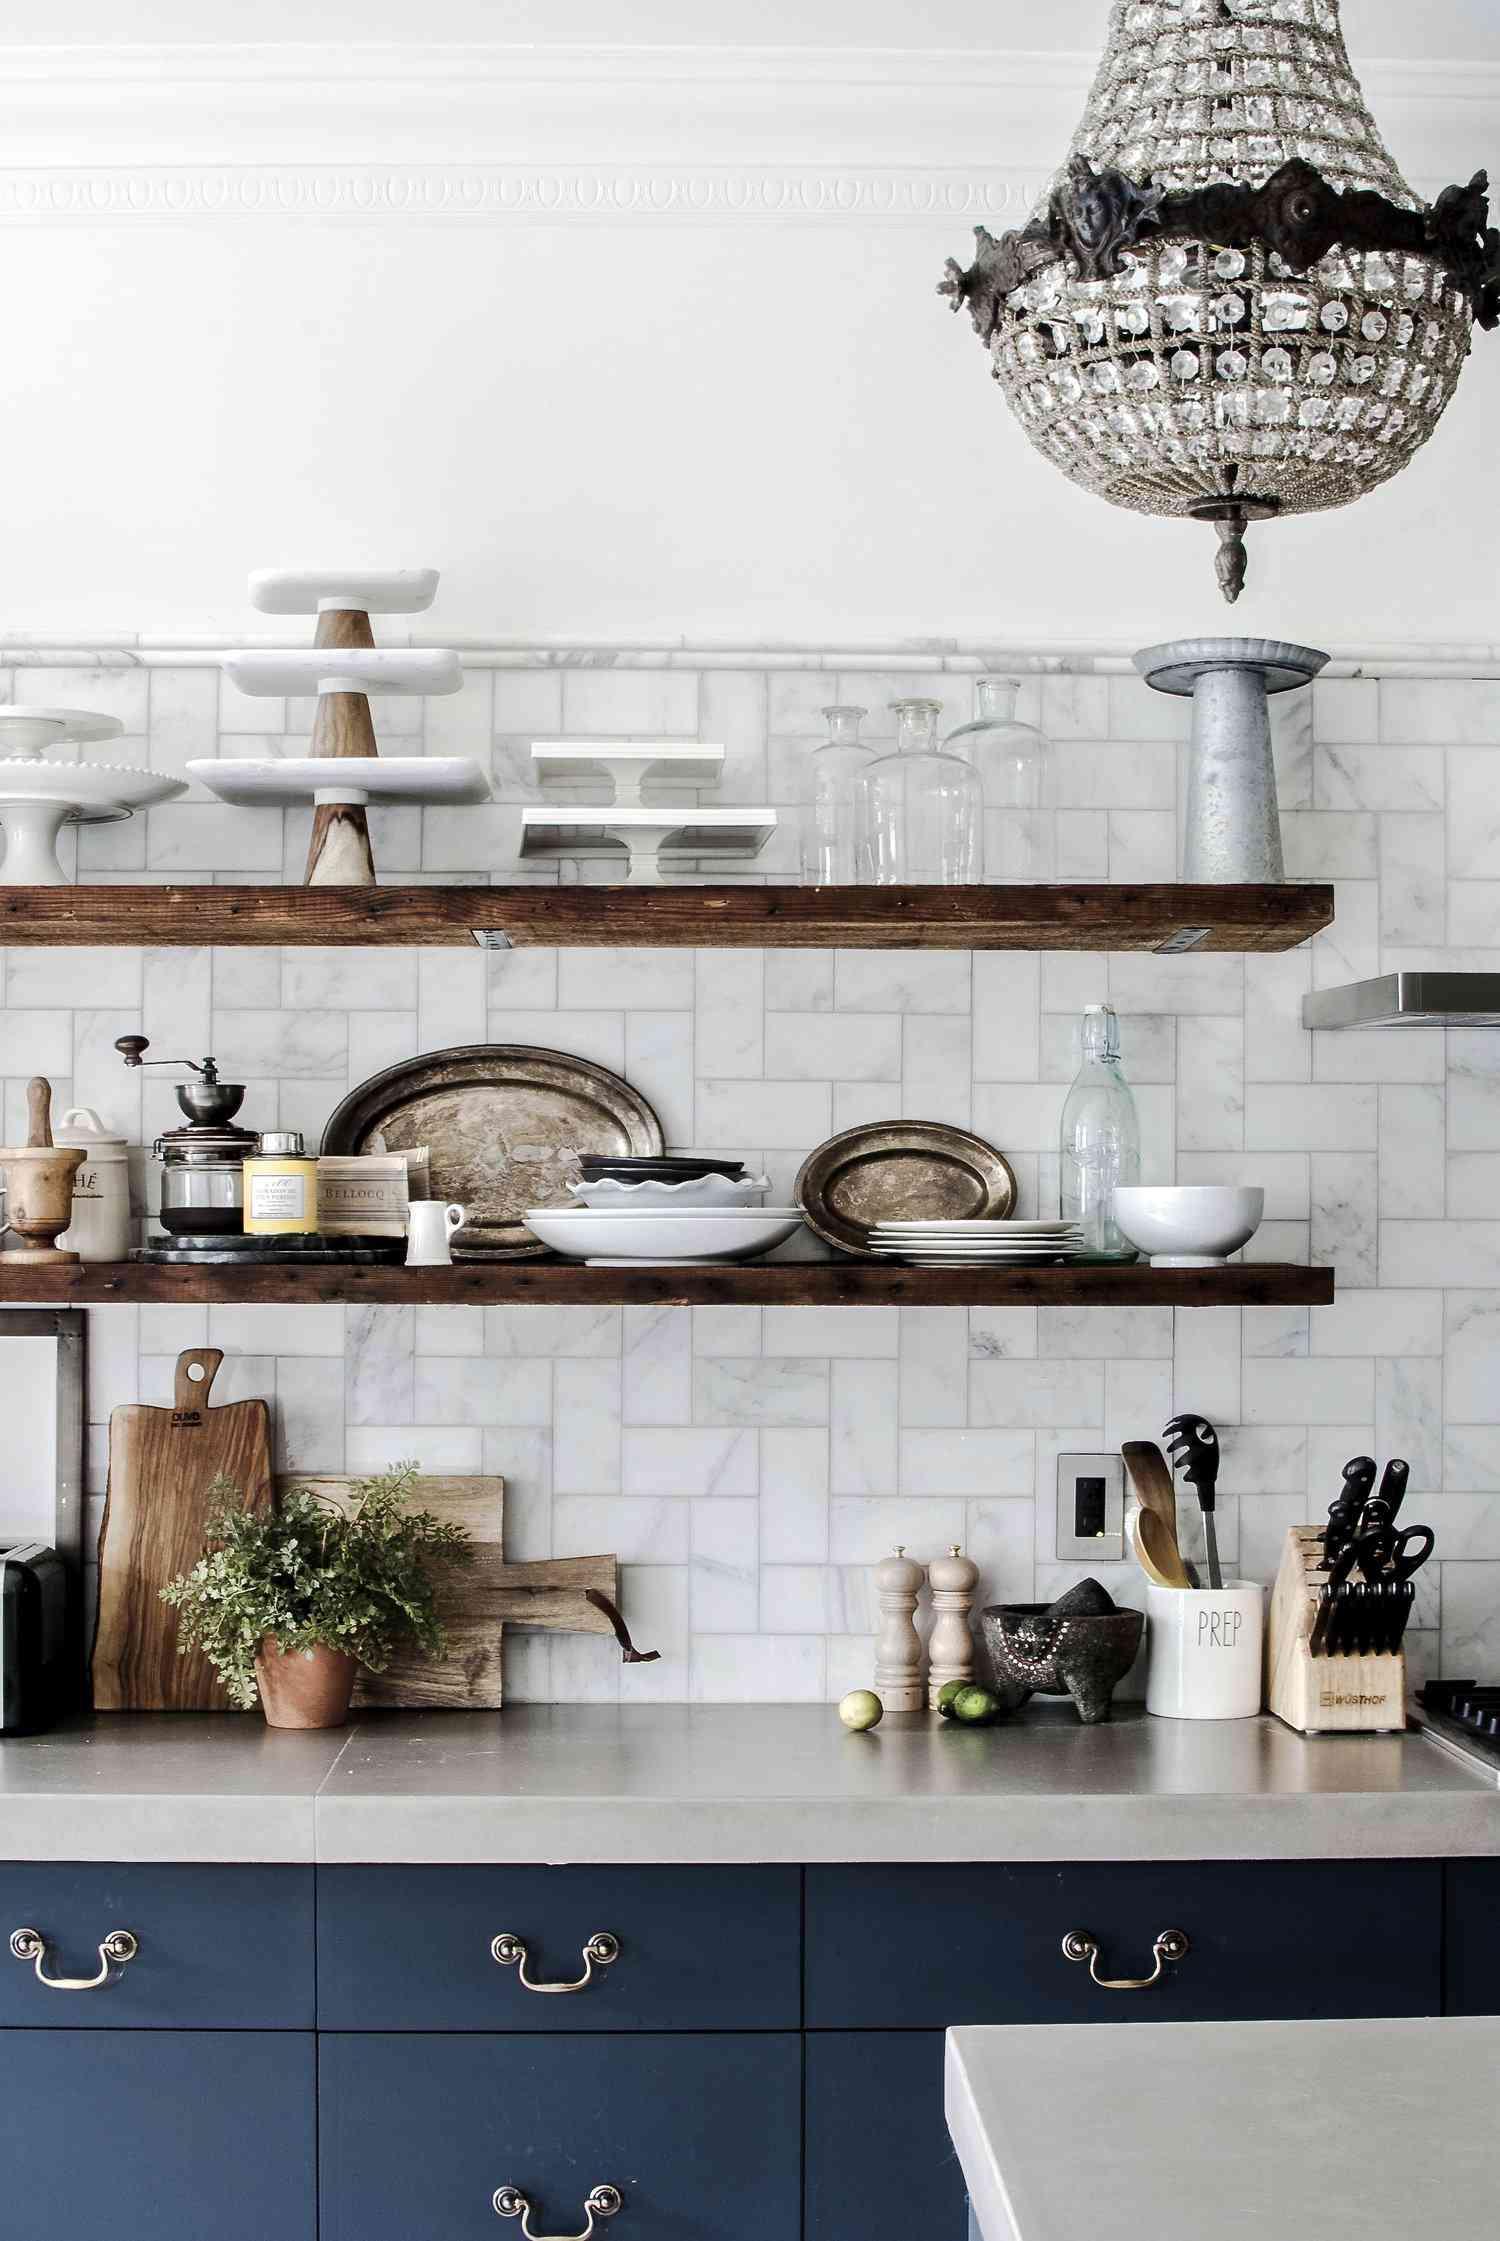 best kitchen ideas - blue cabinets and backsplash in a pattern